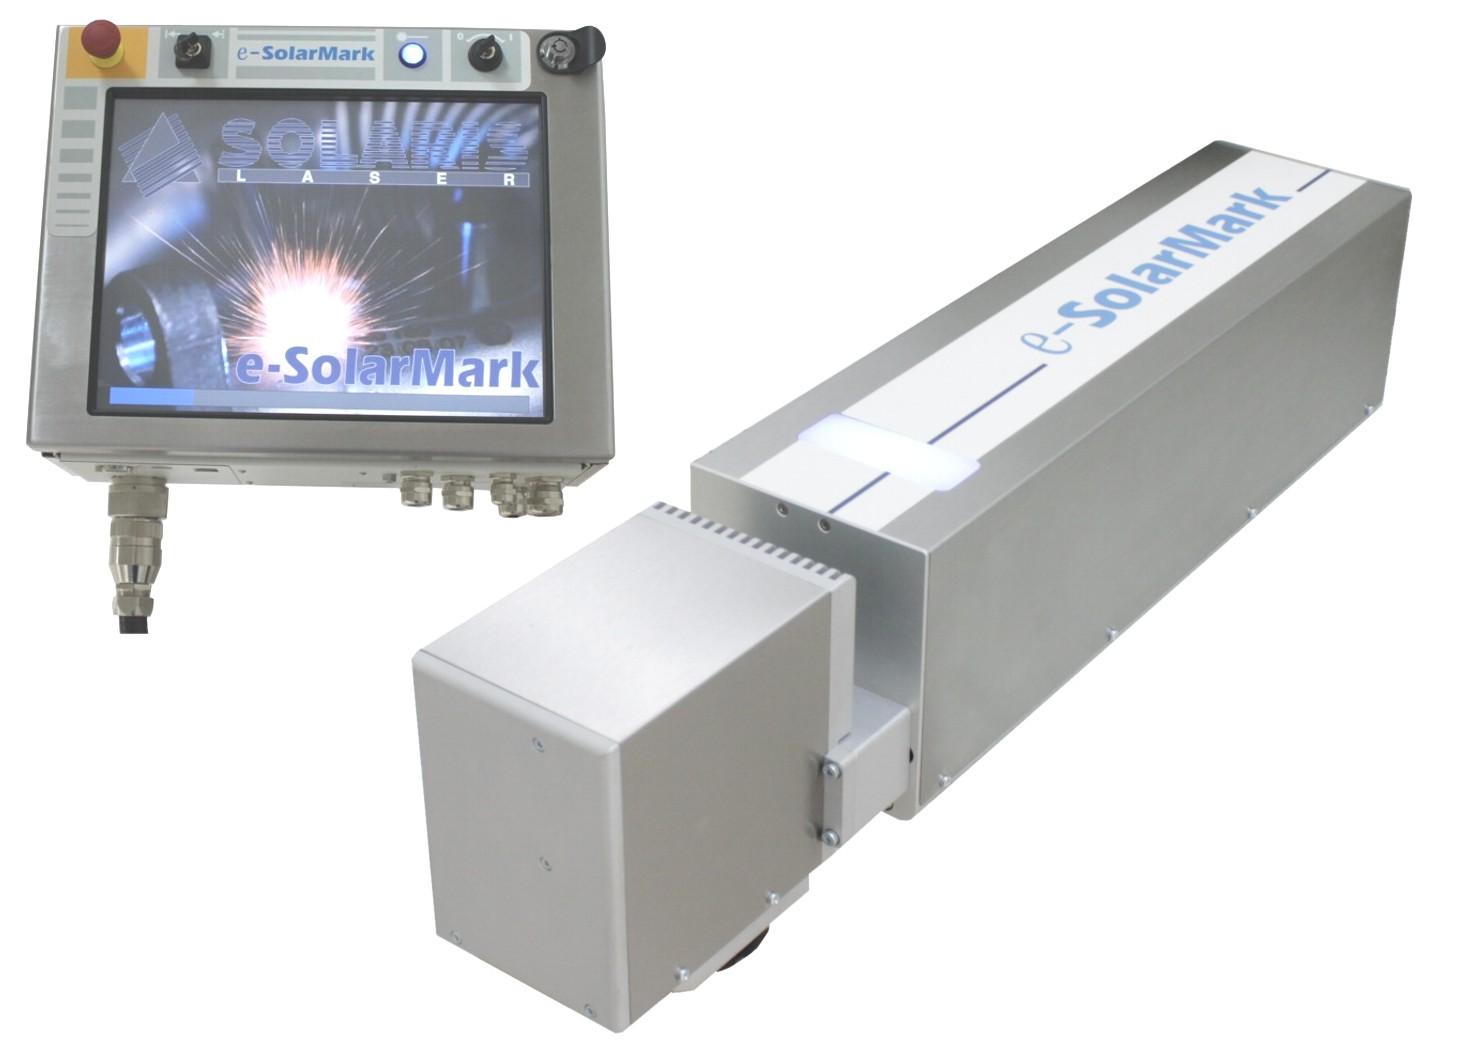 e-SolarMark+ DL